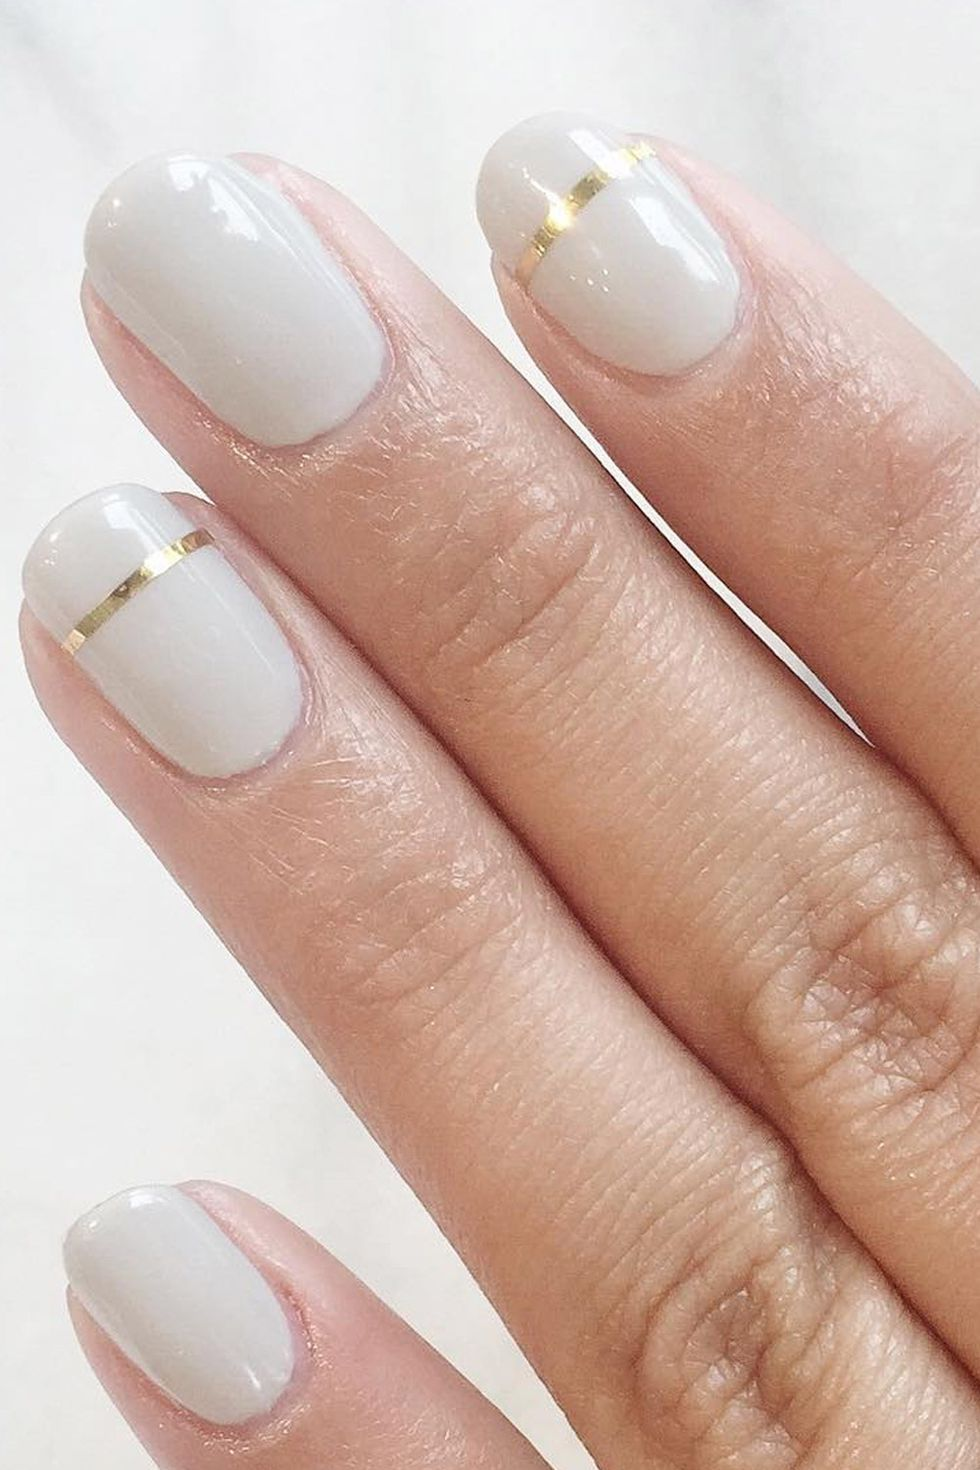 9 Gilded Manicures That Your Fancy Little Nails Deserve